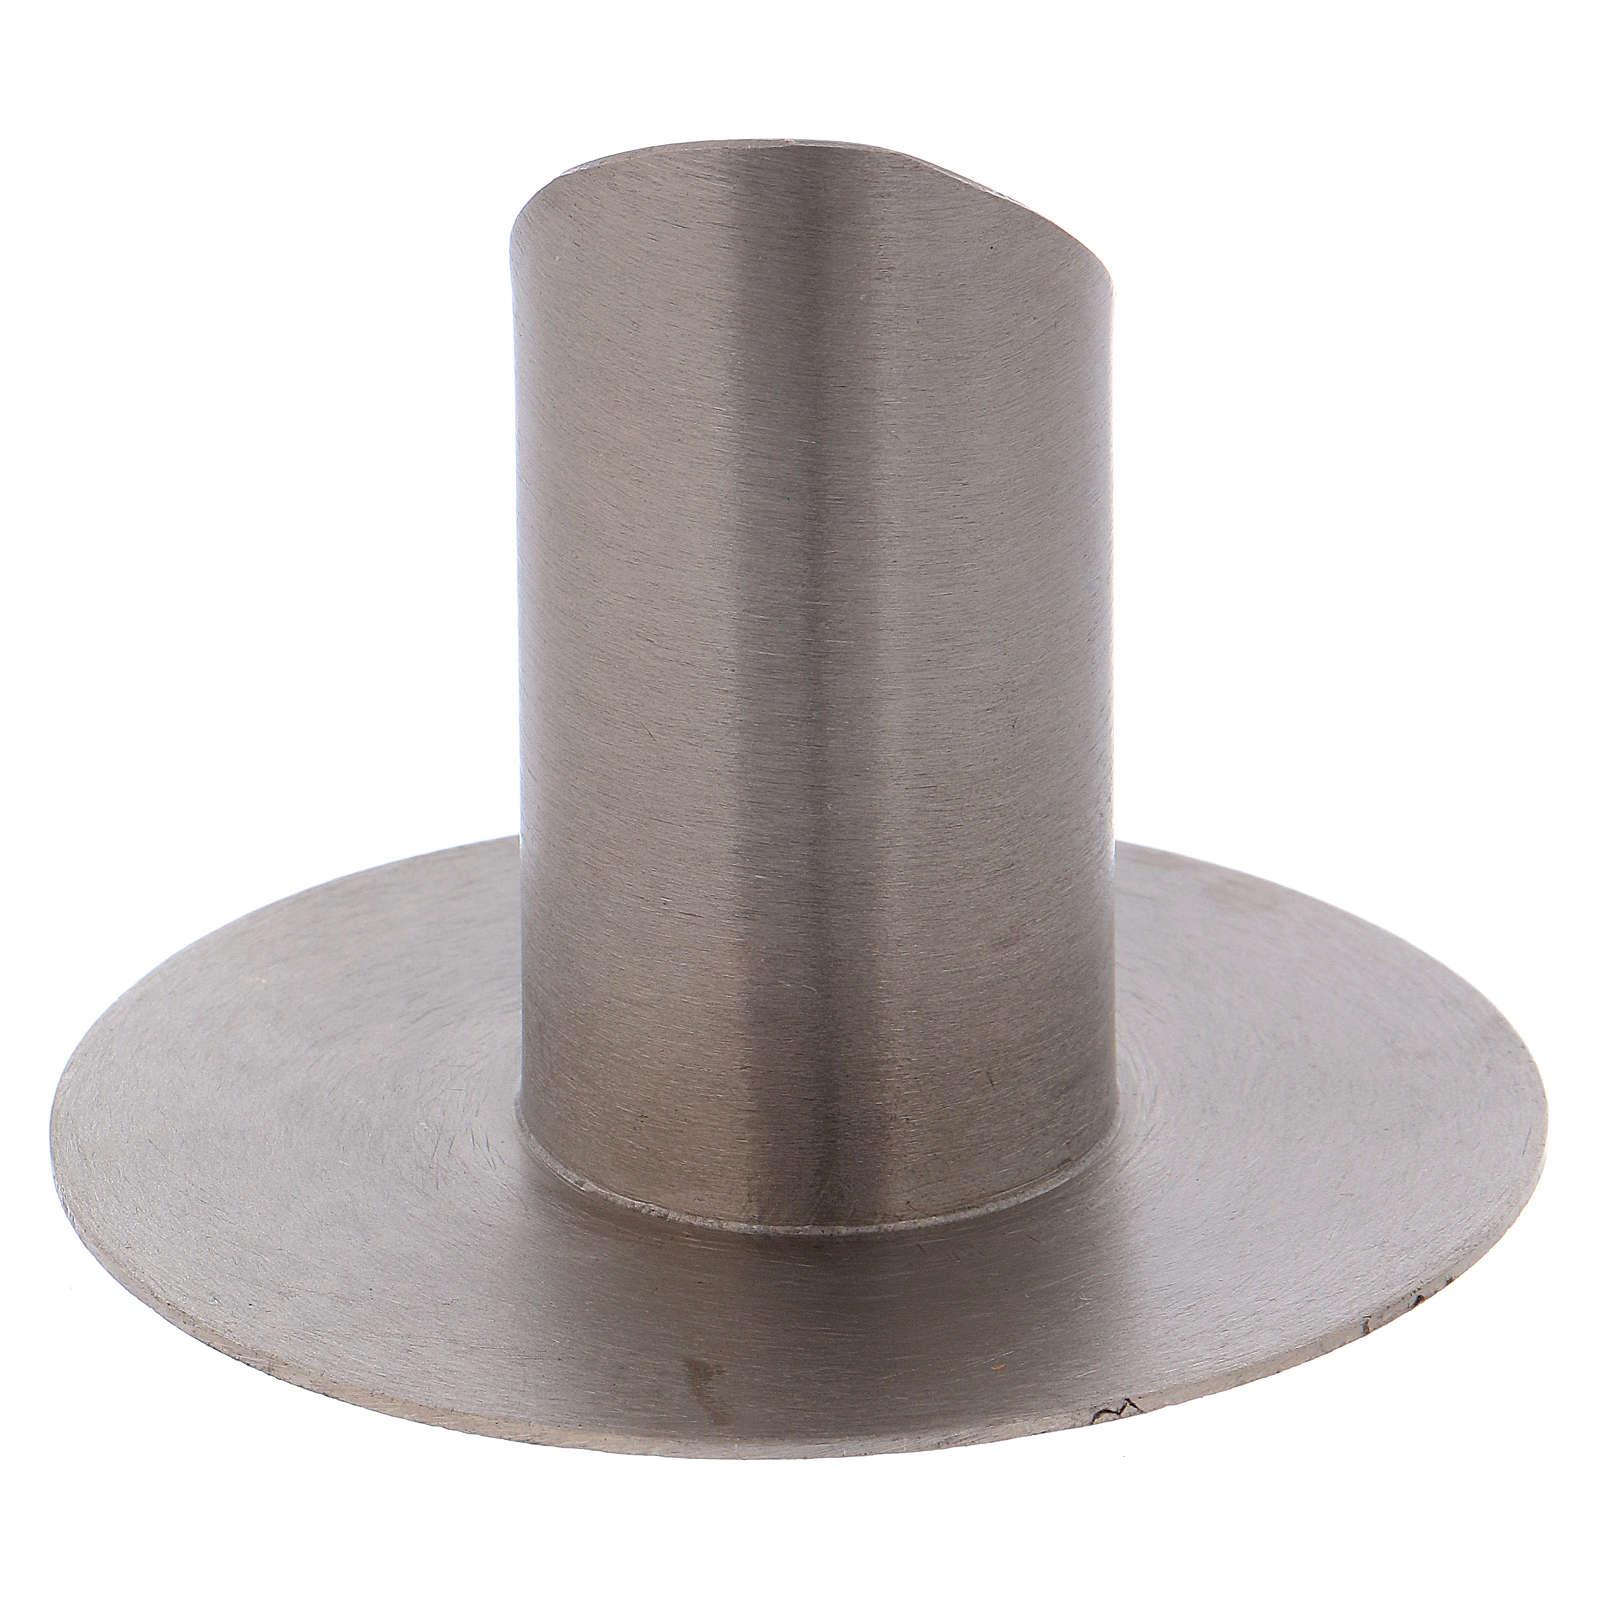 Portacandela tubolare con apertura ottone argentato opaco 3 cm 4